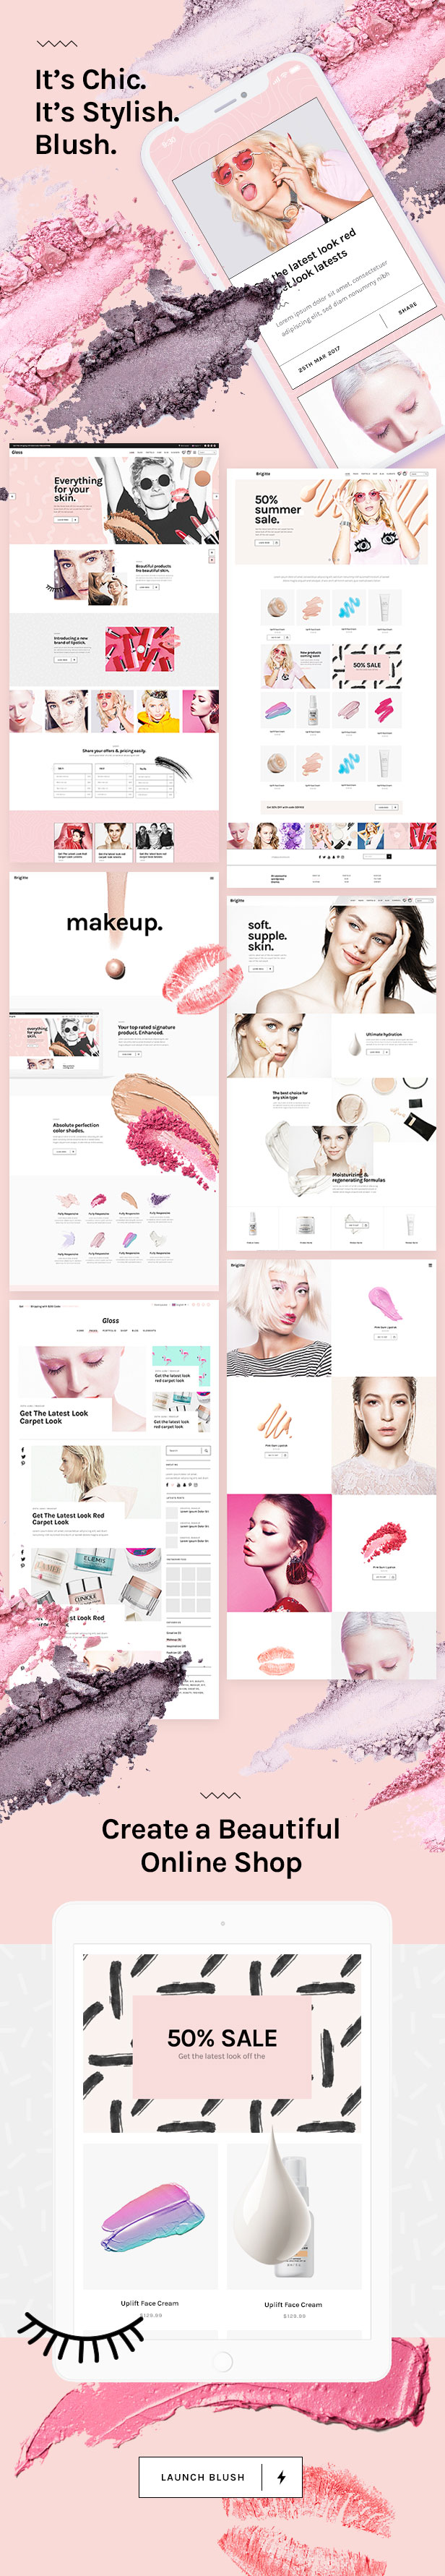 WordPress theme Blush - A Trendy Beauty and Lifestyle Theme (Health & Beauty)